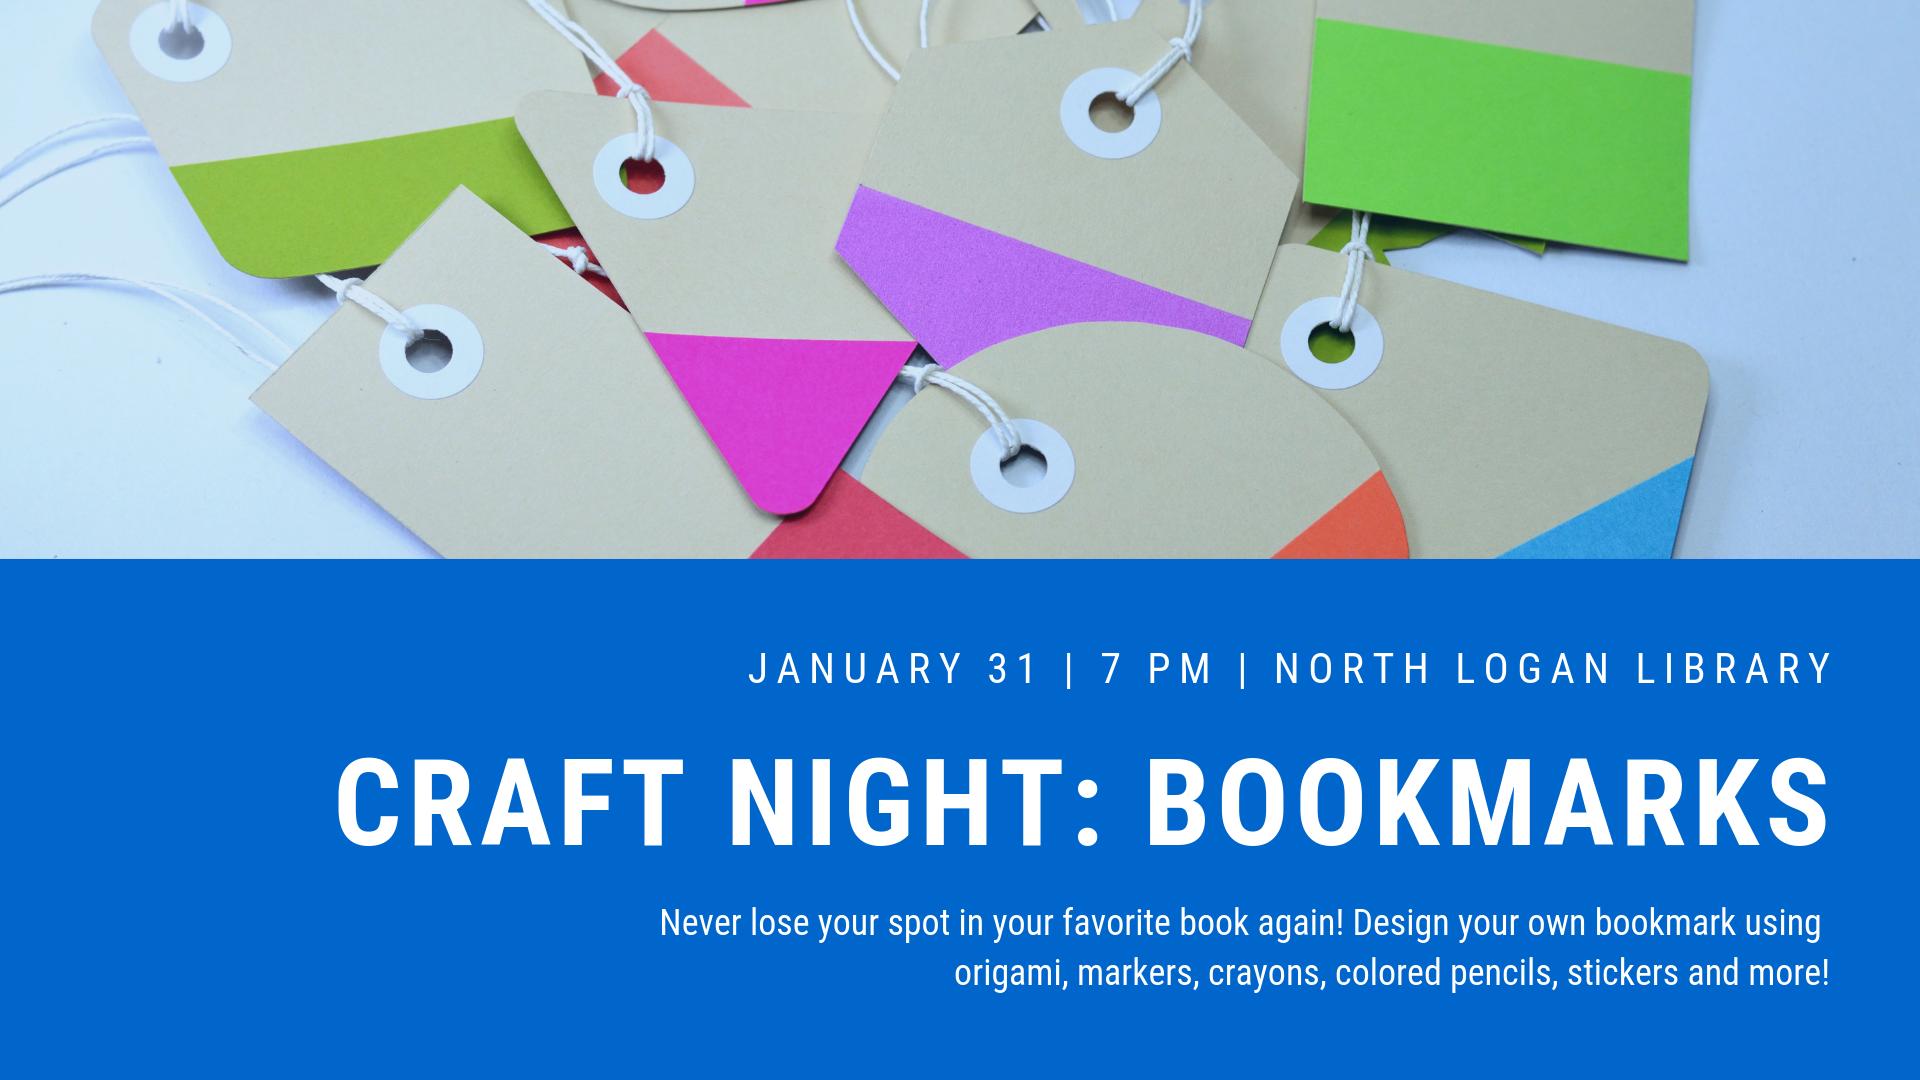 Craft Night: Bookmarks